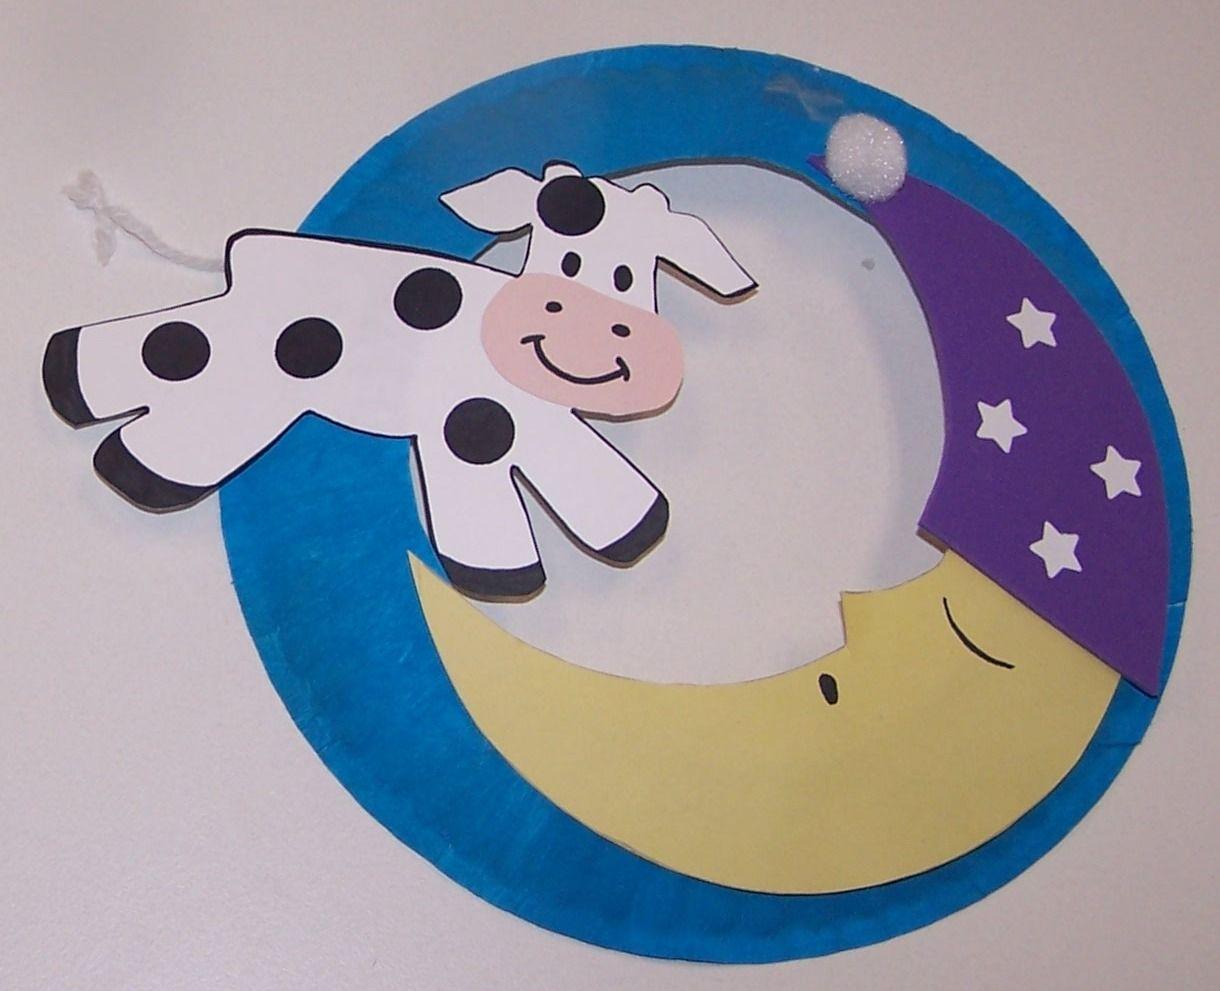 Cow Over The Moon Craft For Preschoolers